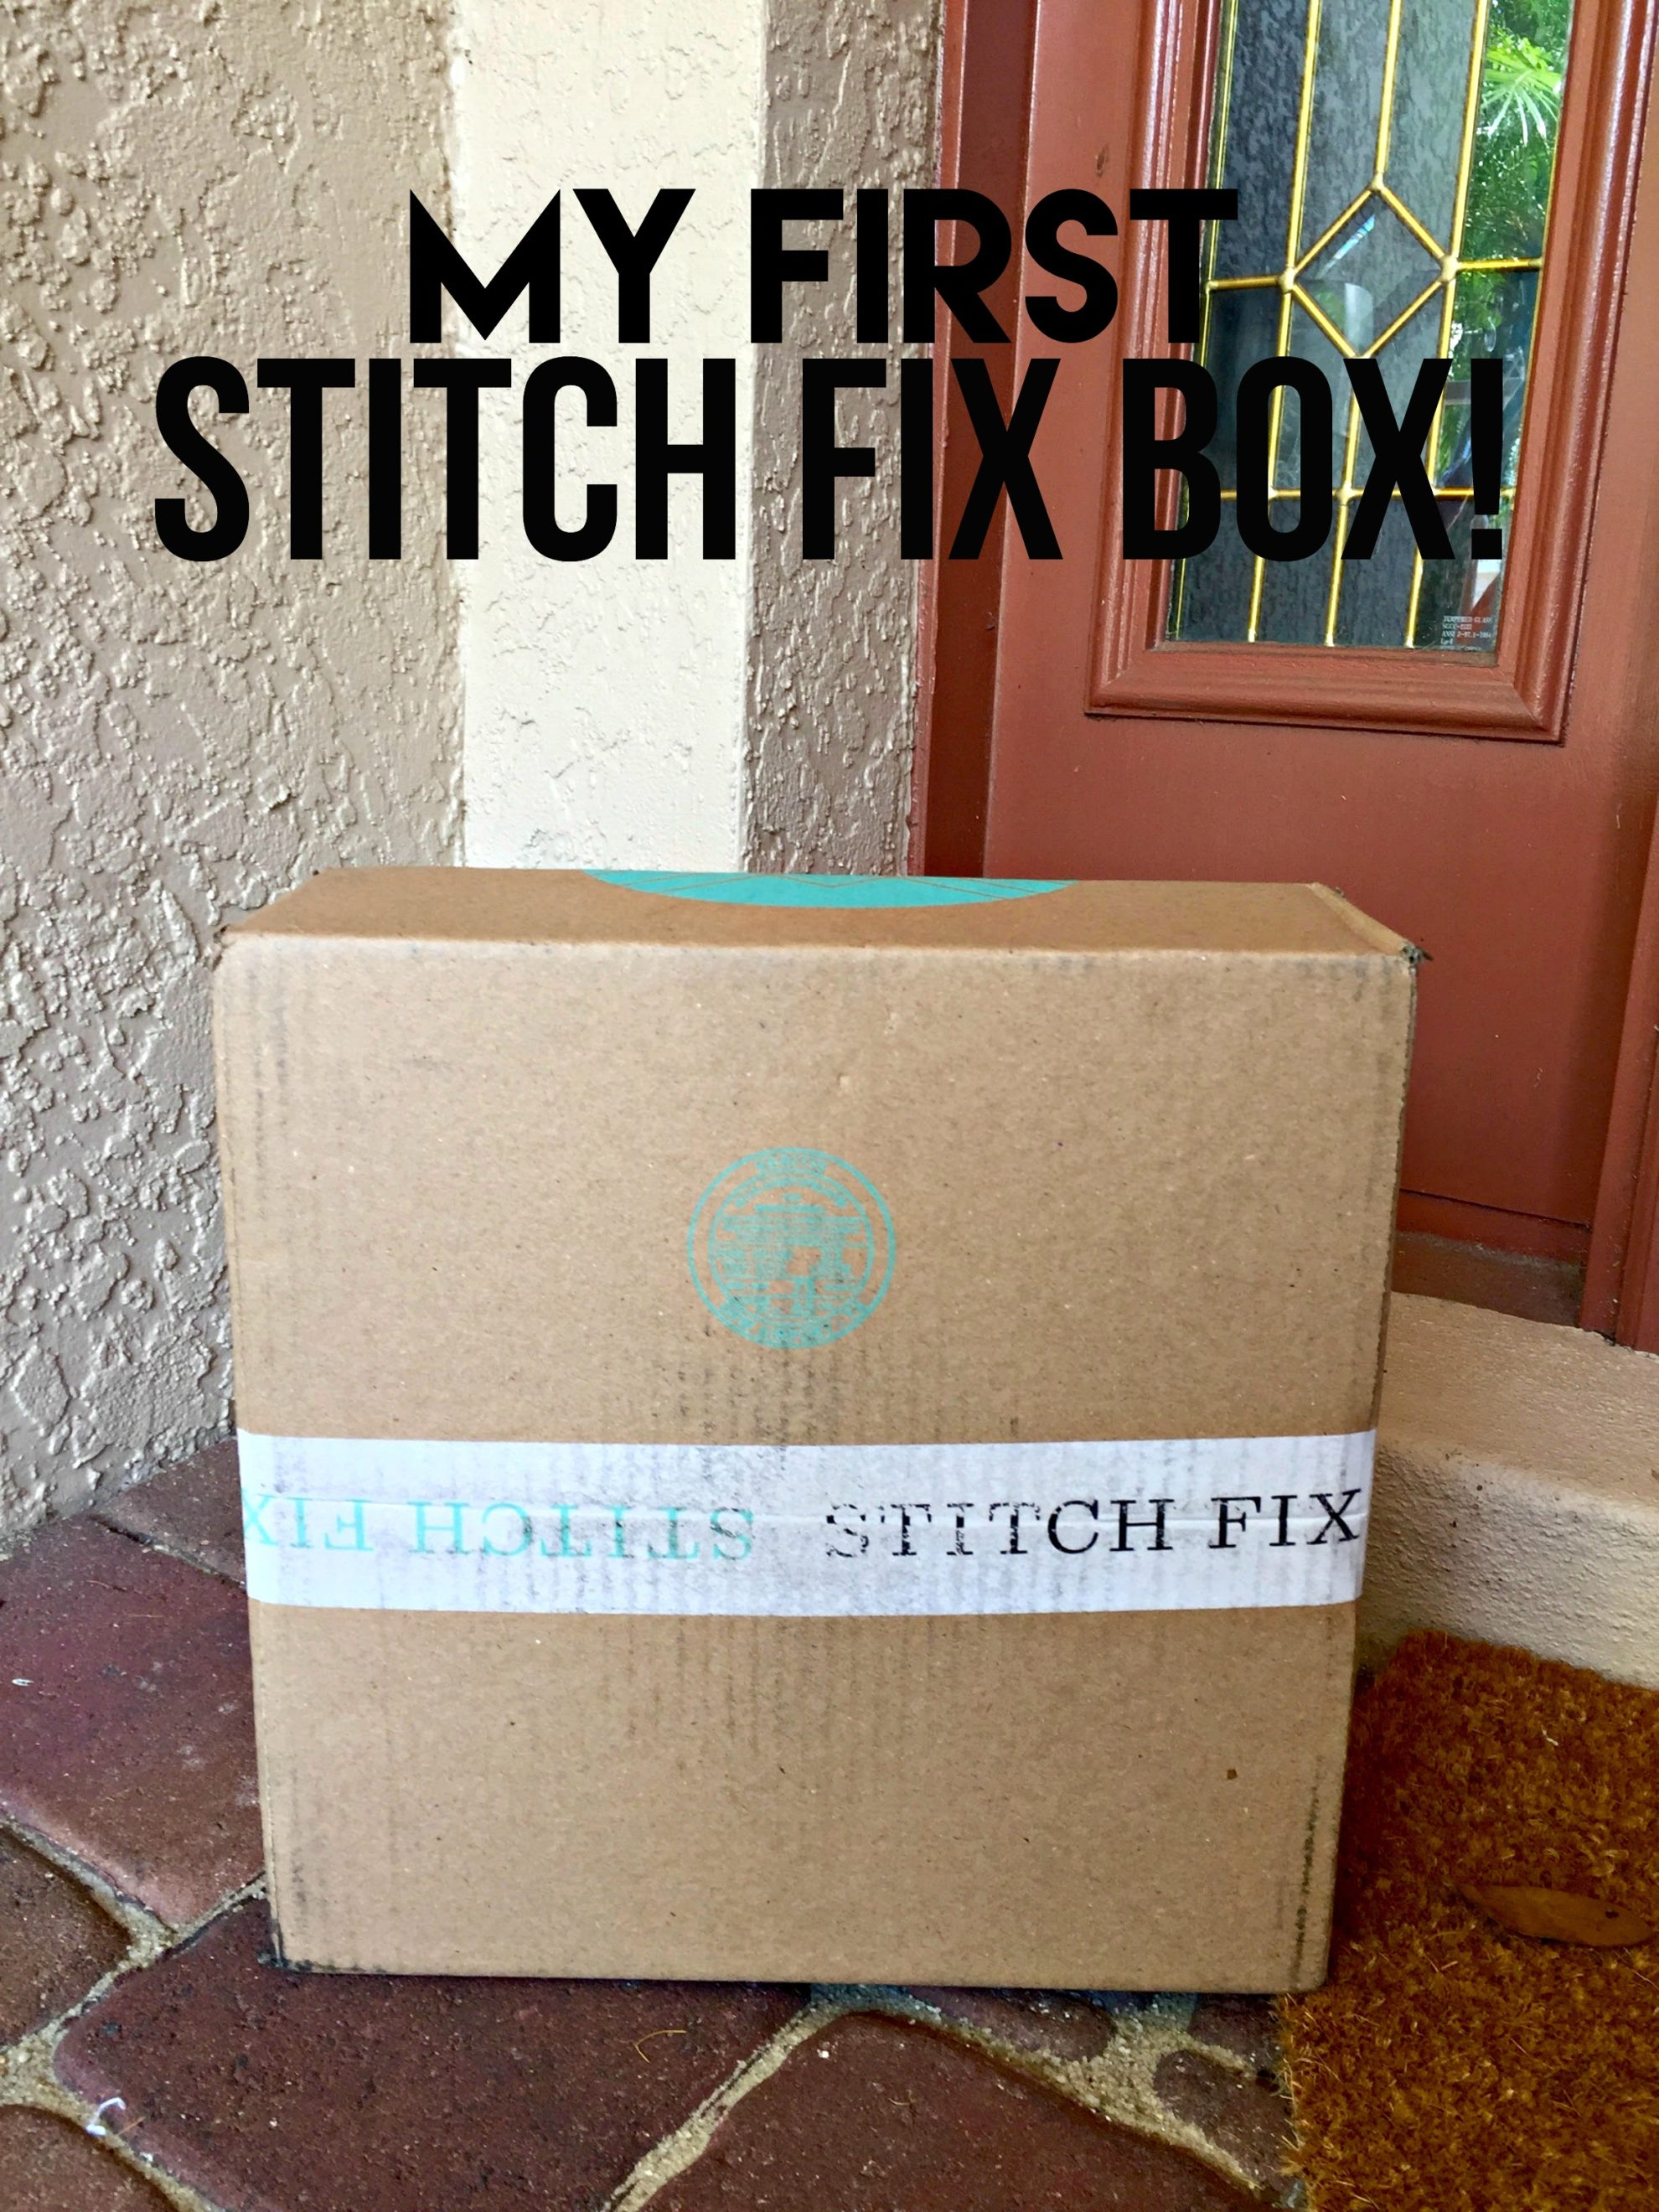 My First Stitch Fix Box!